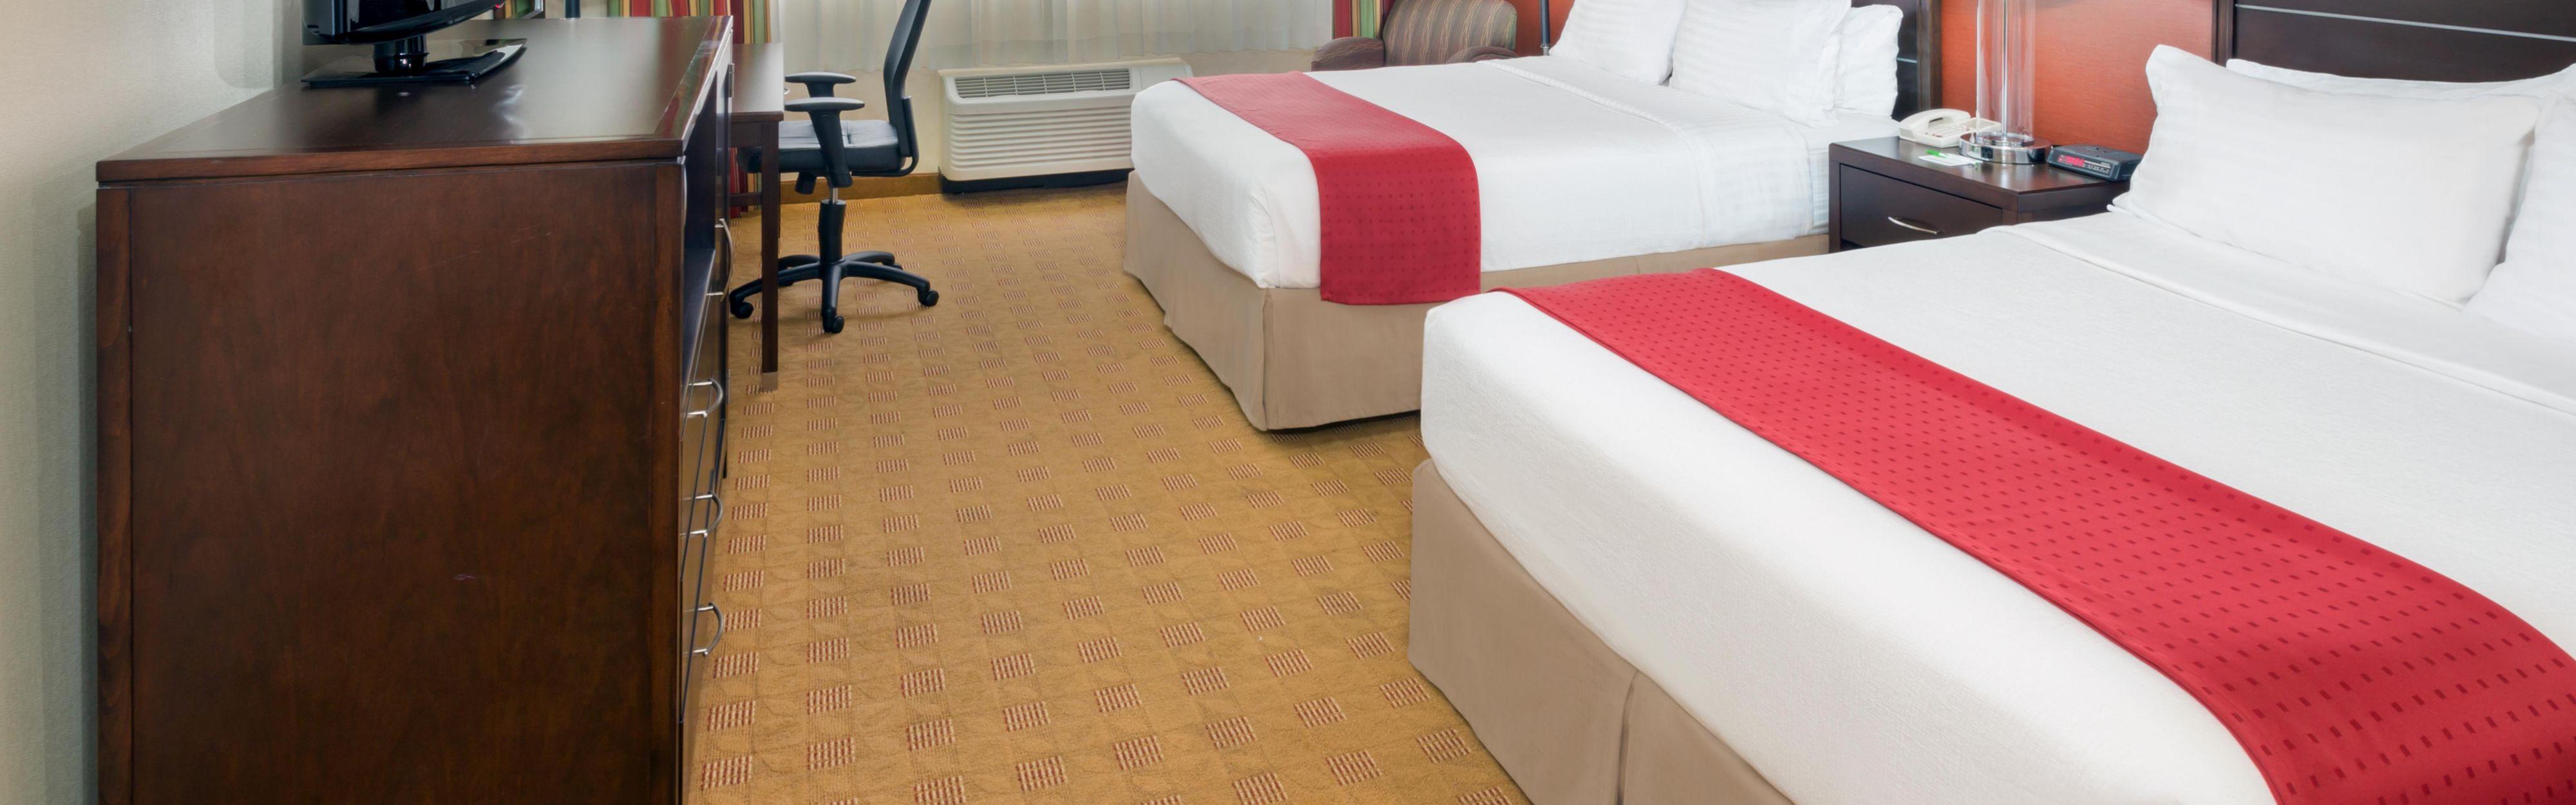 Holiday Inn Santa Ana-Orange Co. Arpt image 1